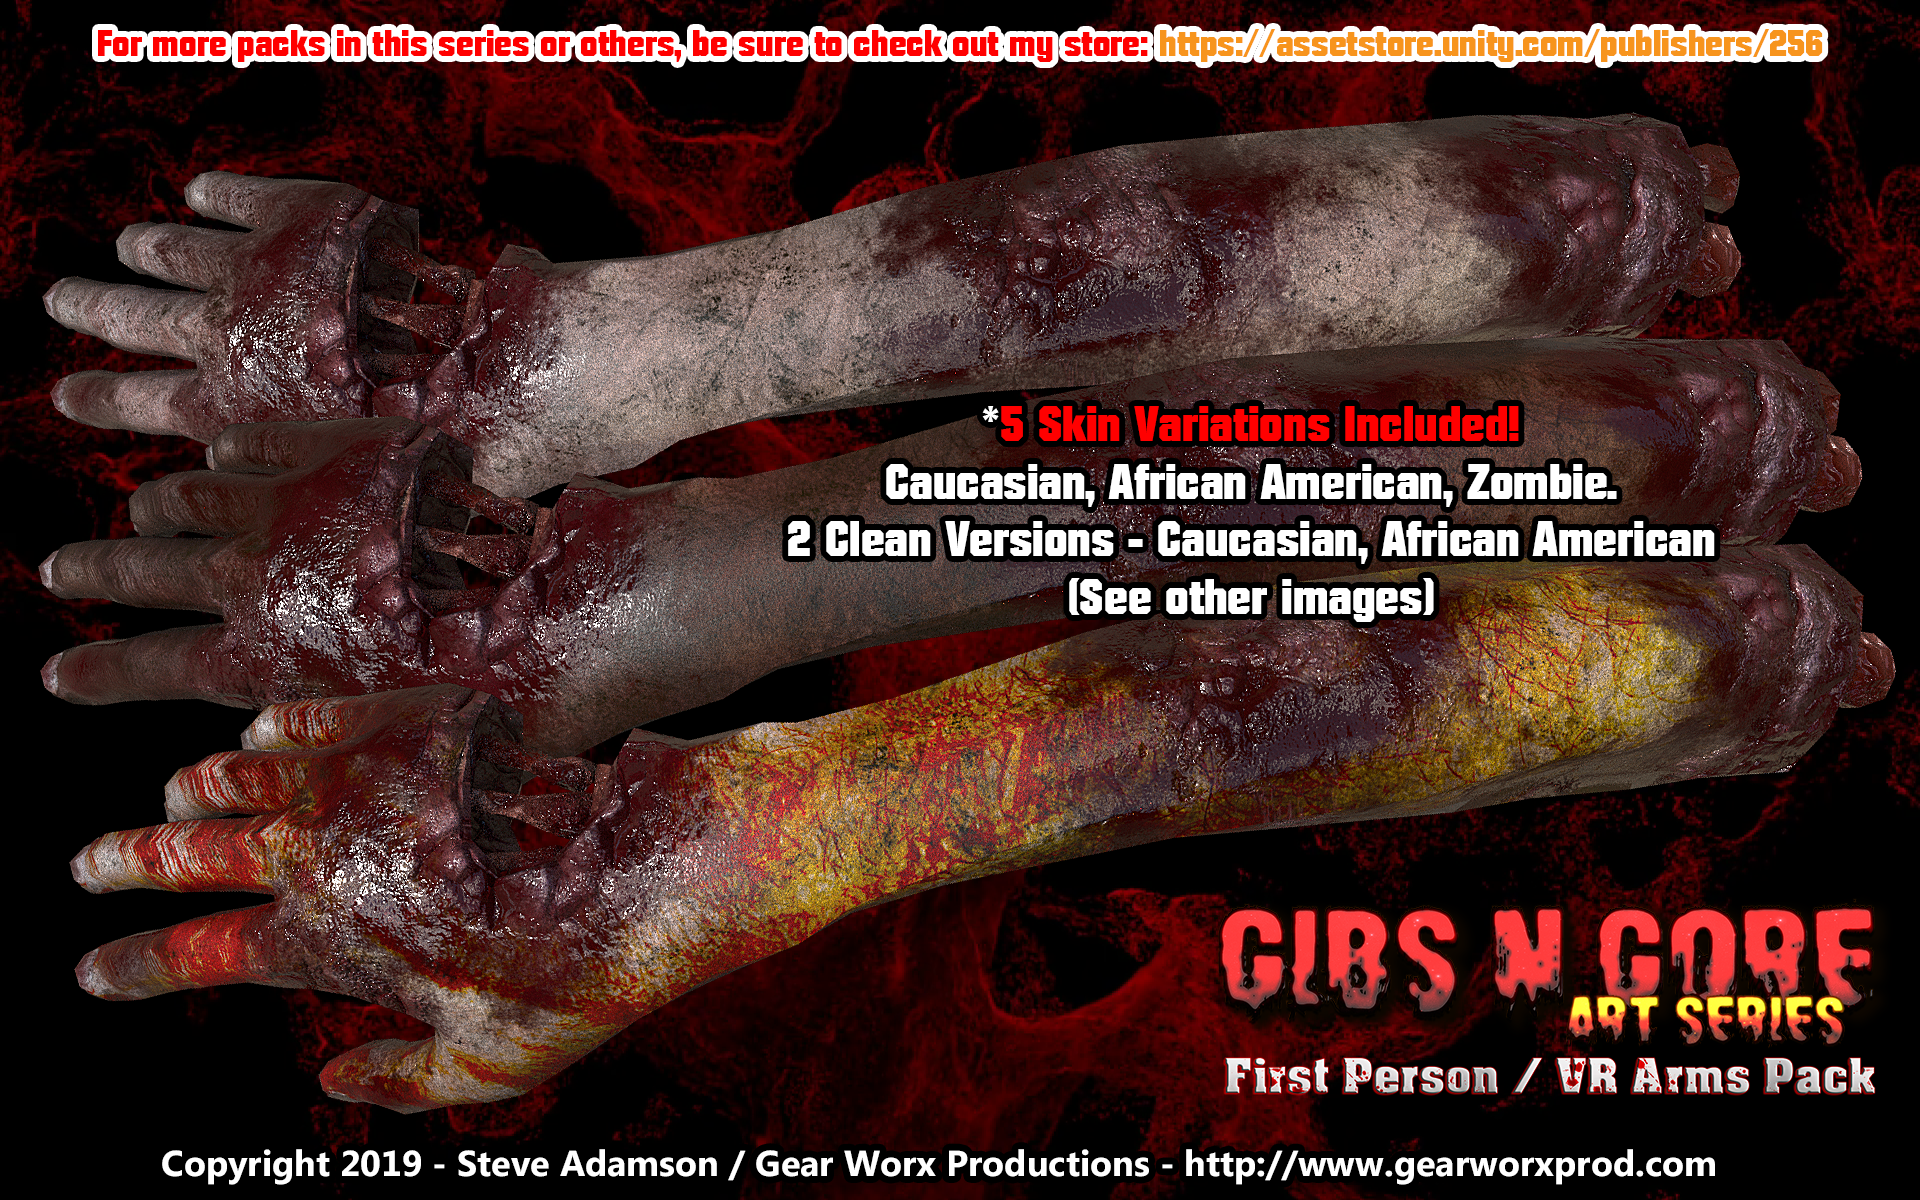 GNG_FP_Skin_Variations_P1.png